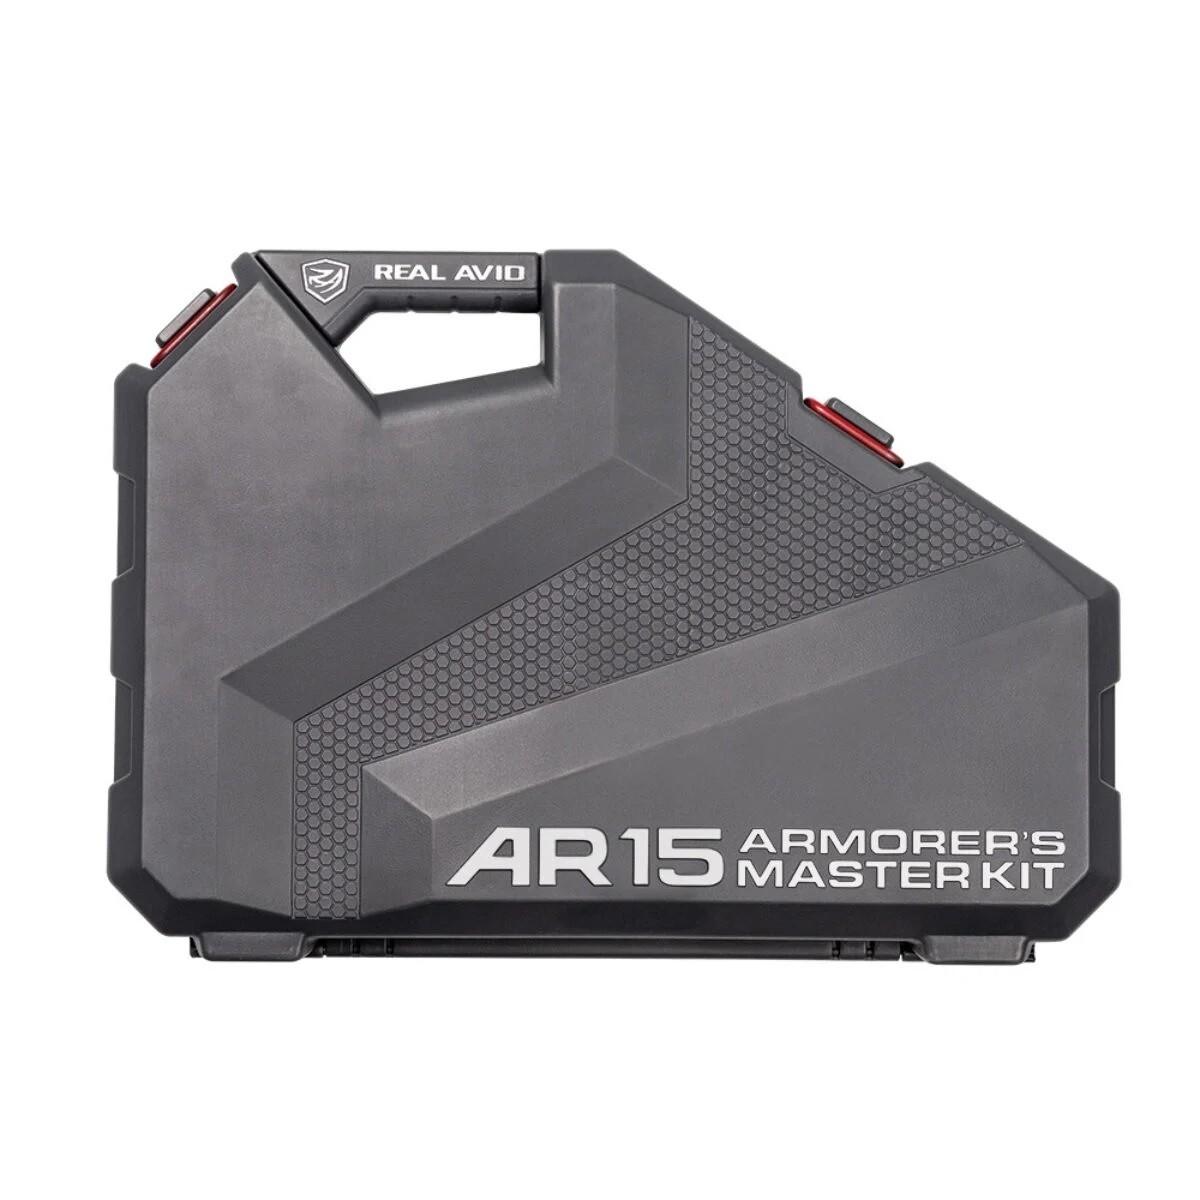 Real Avid Armorer's Master Kit